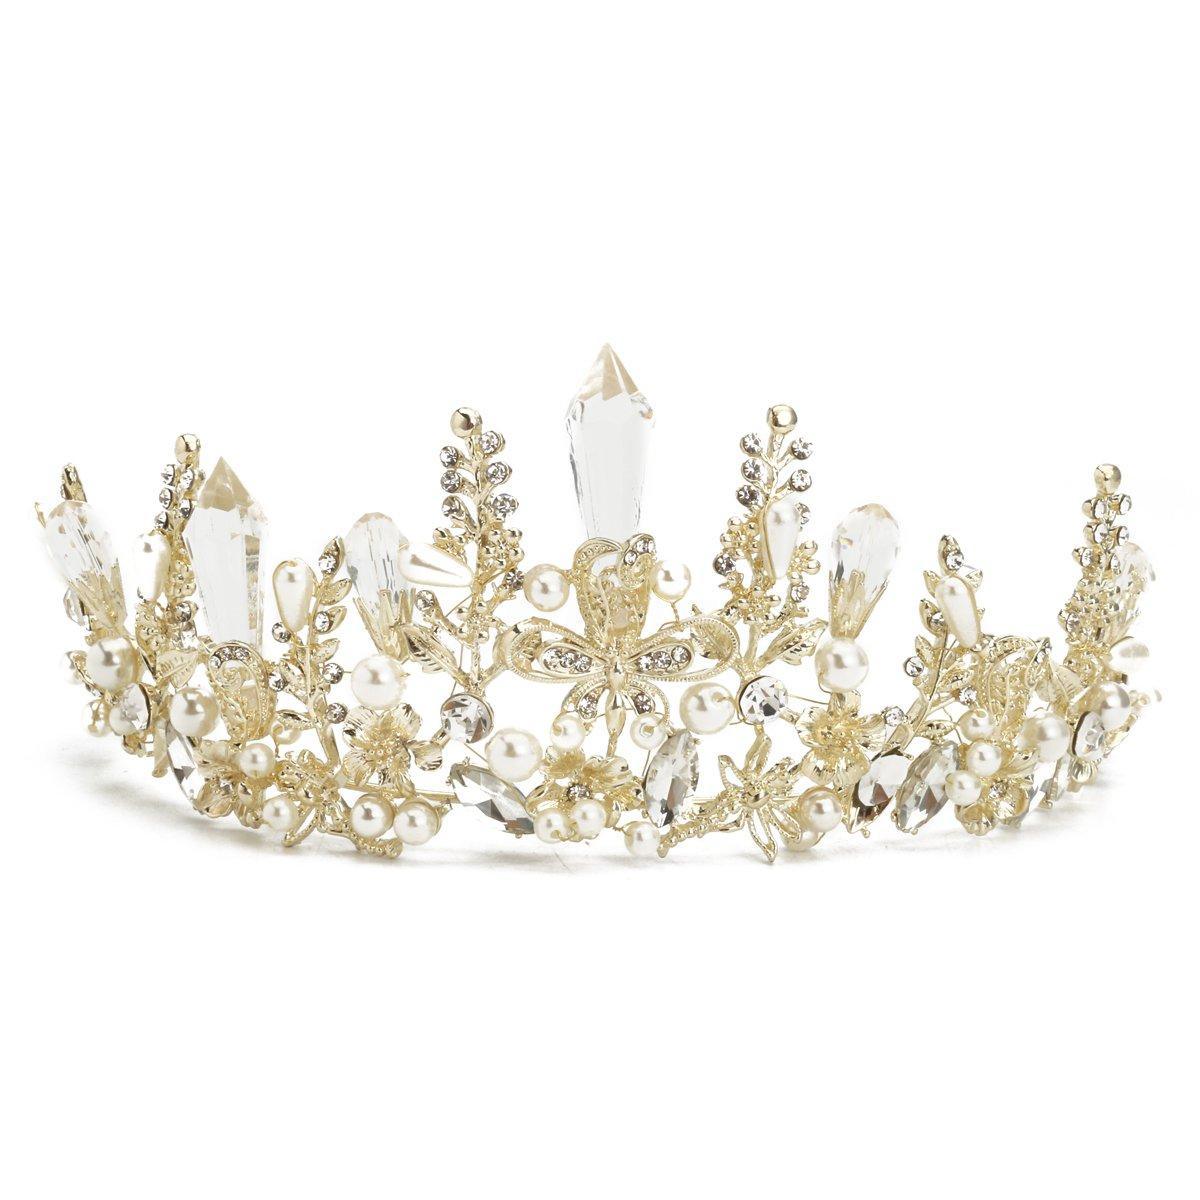 SODIAL Queen Baroque Bridal Wedding Gold Crystal Pearl Crown Tiara Headband Headpiece 147811